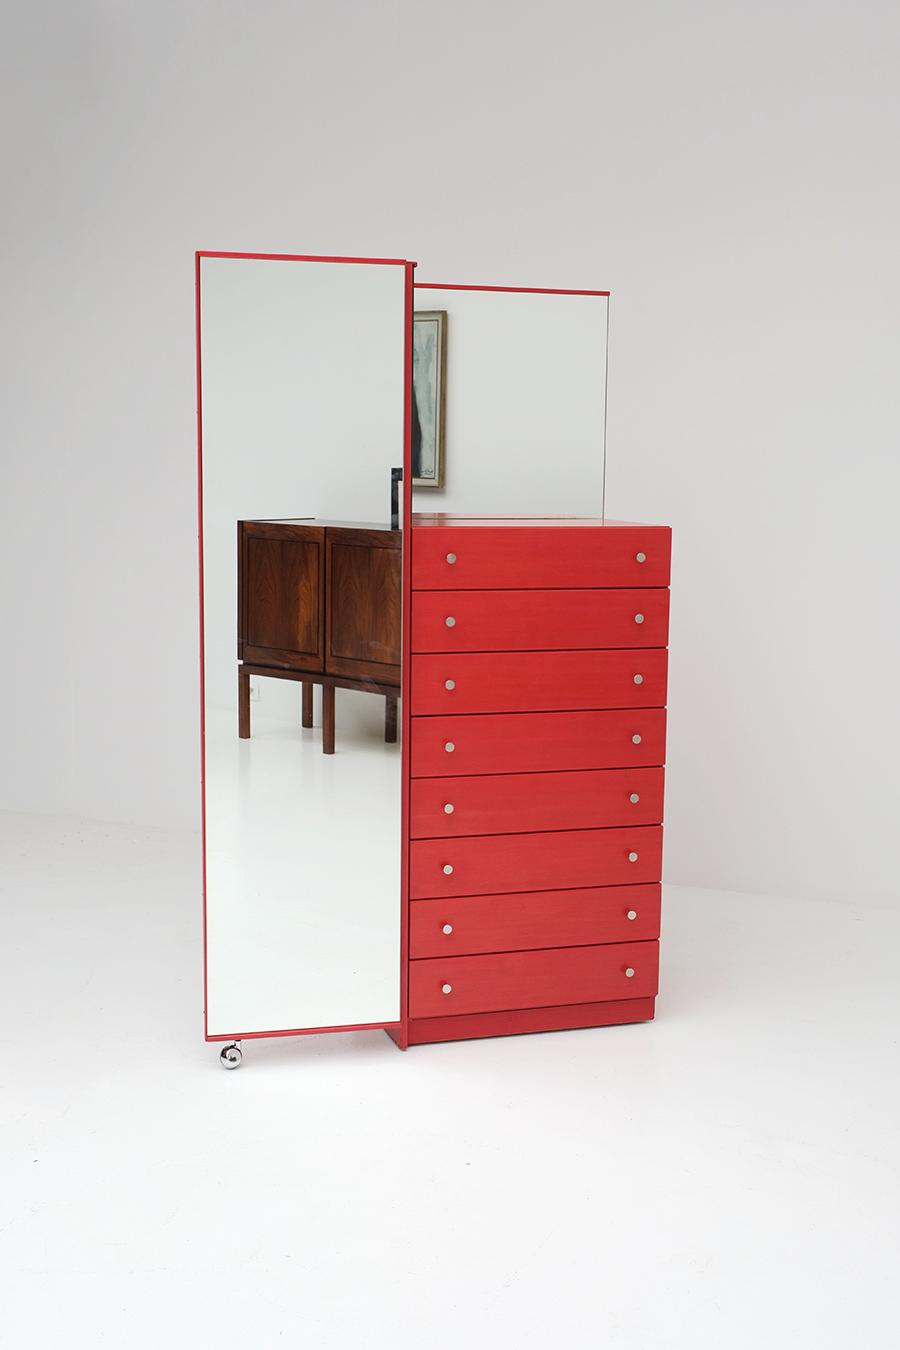 Red Commode Dresser Mirrorimage 3